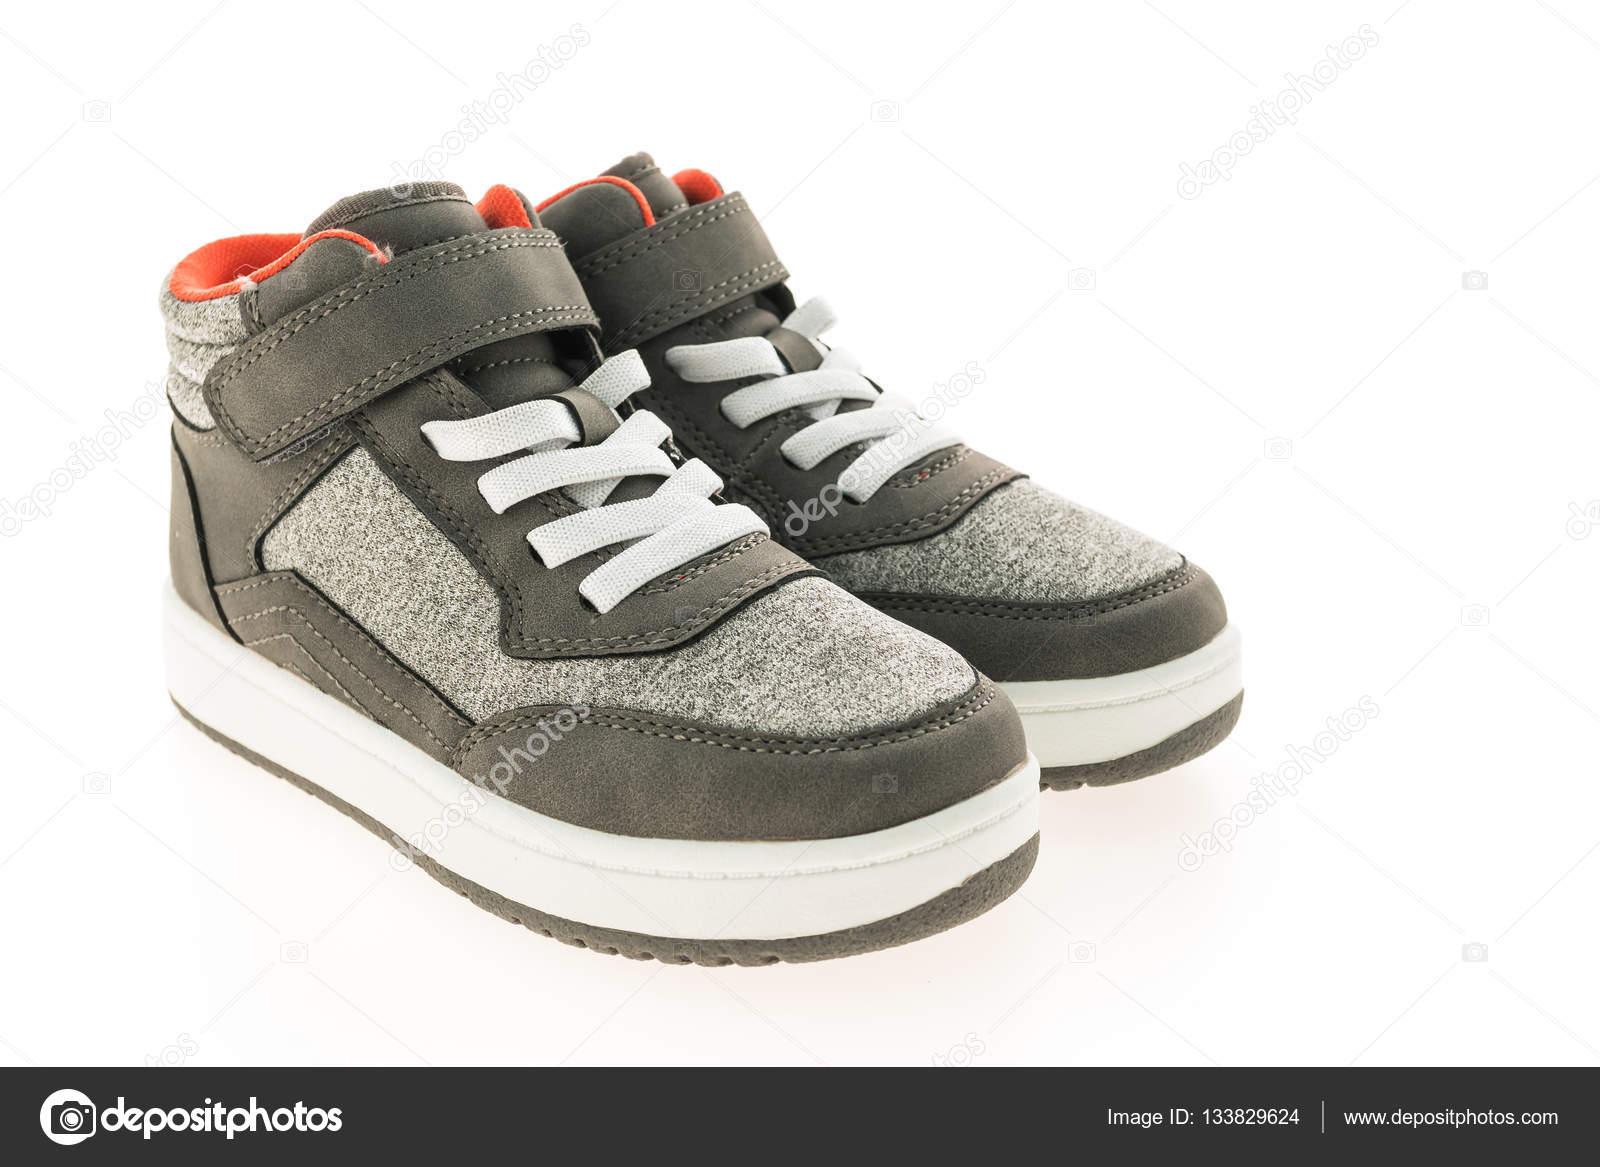 71c479220a8 Μόδα παπούτσια και αθλητικά — Φωτογραφία Αρχείου © mrsiraphol #133829624